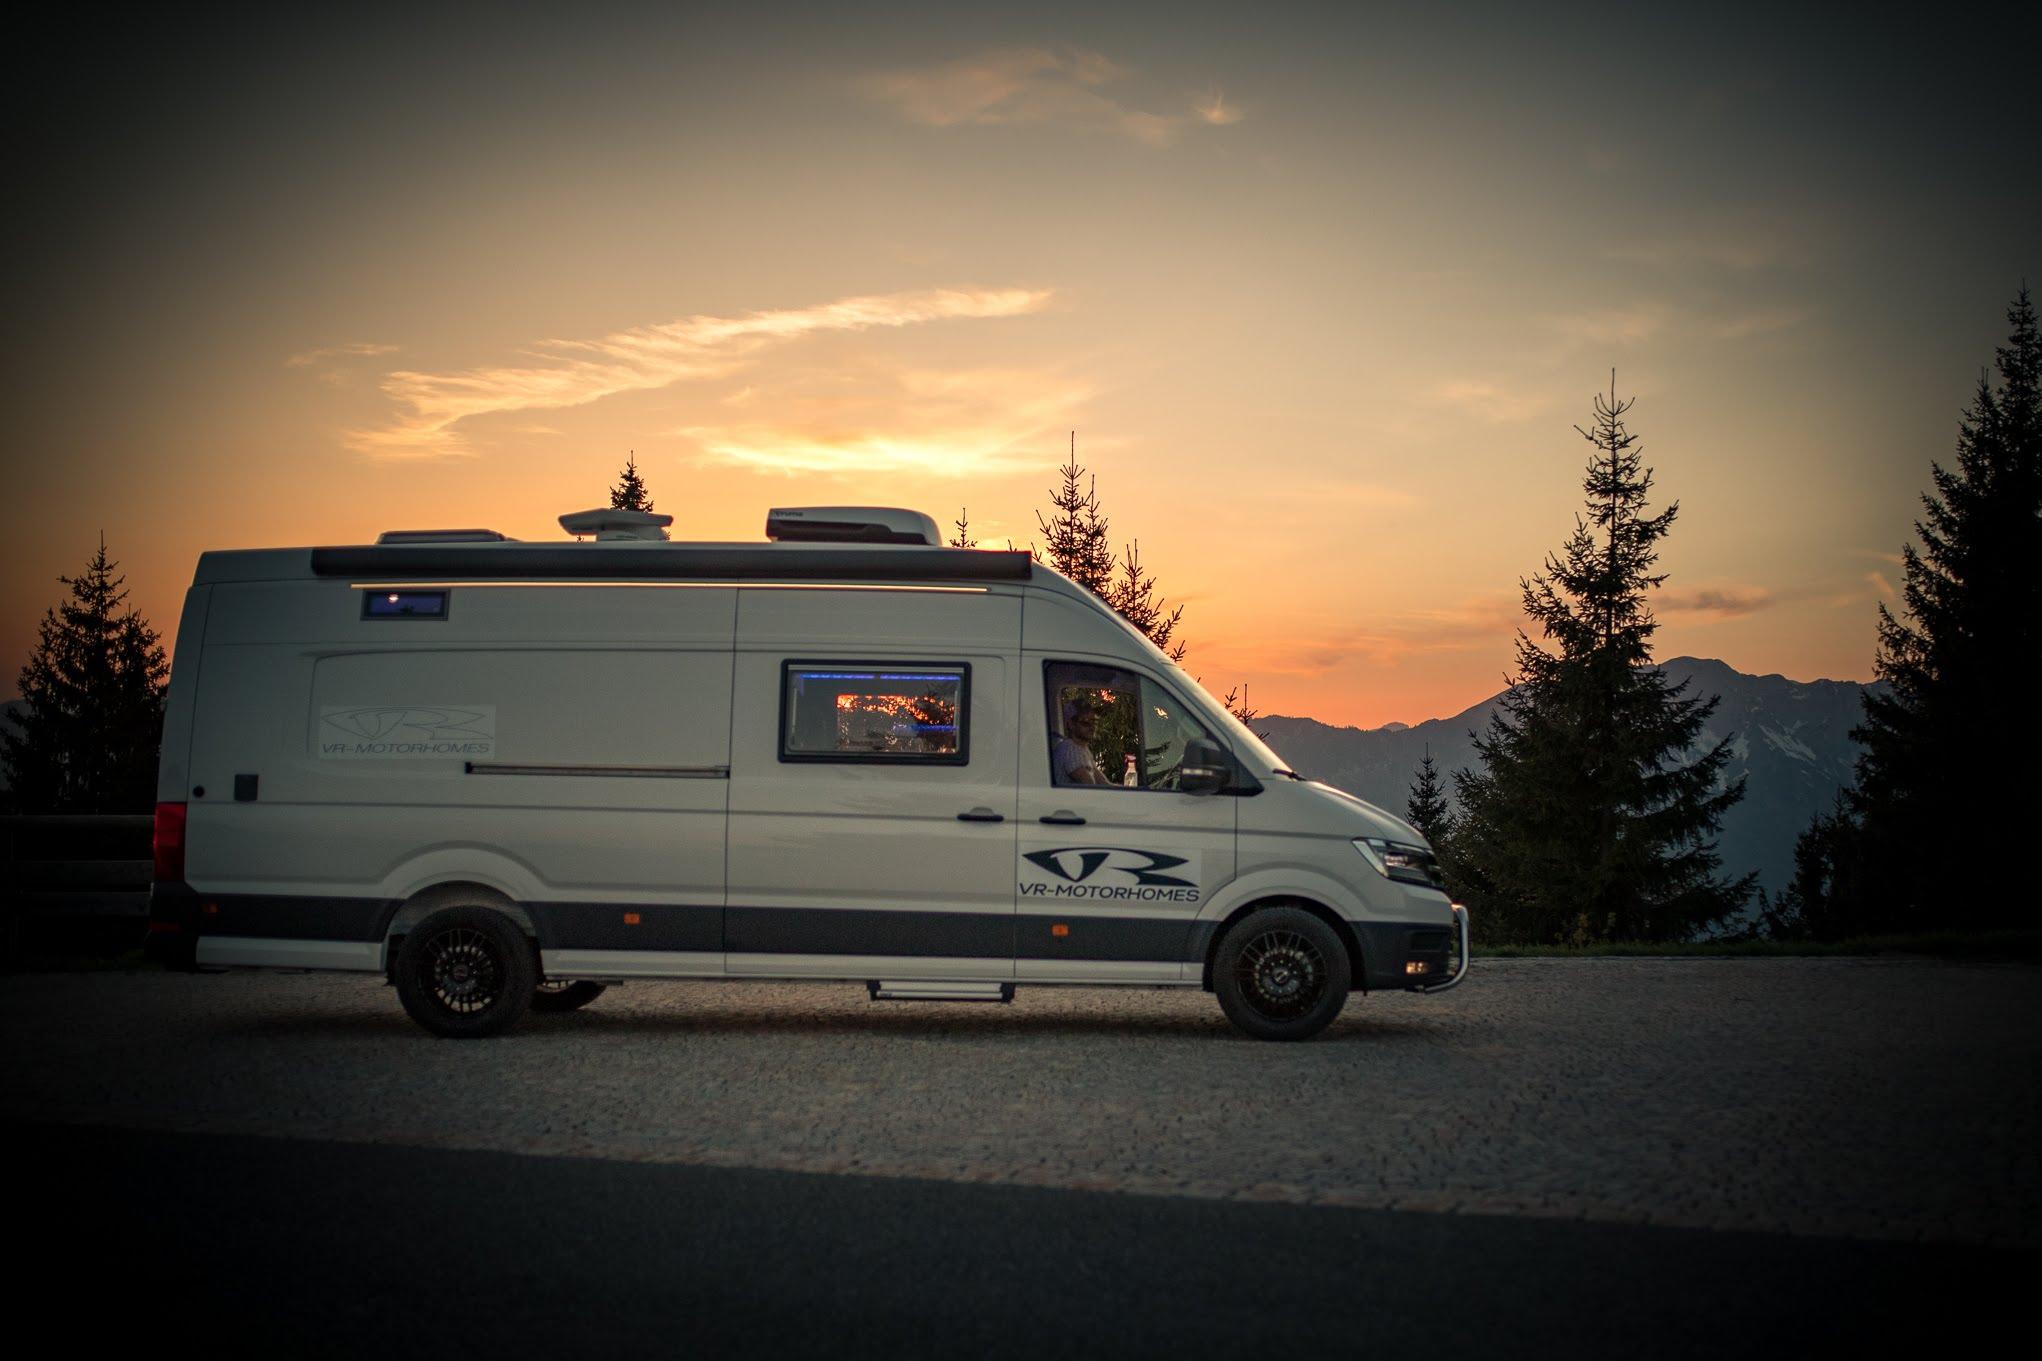 volkswagen crafter vr motorhomes nicest greatest luxurious the world ever seen vr-motorhomes handtuchwaermer wohnmobil